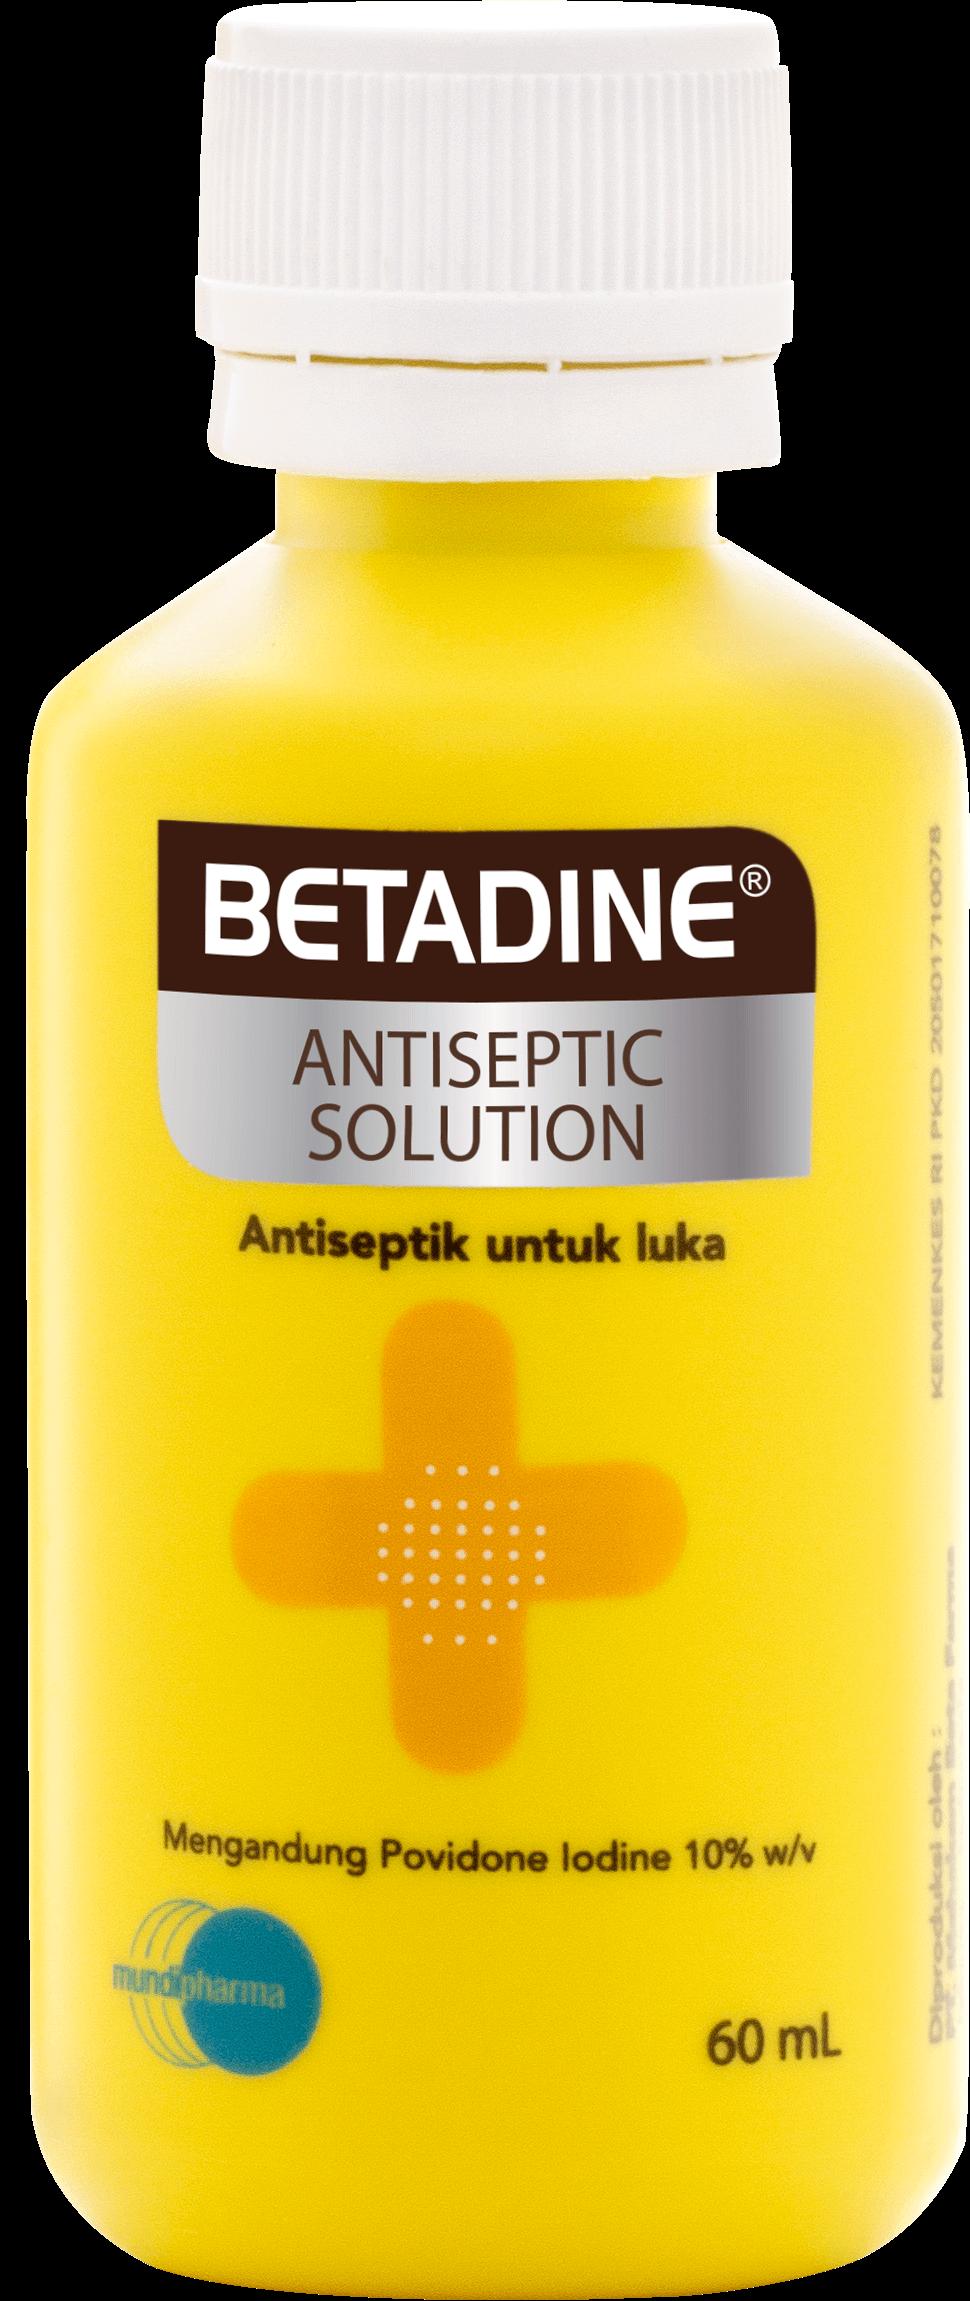 BETADINE® Antiseptic Solution